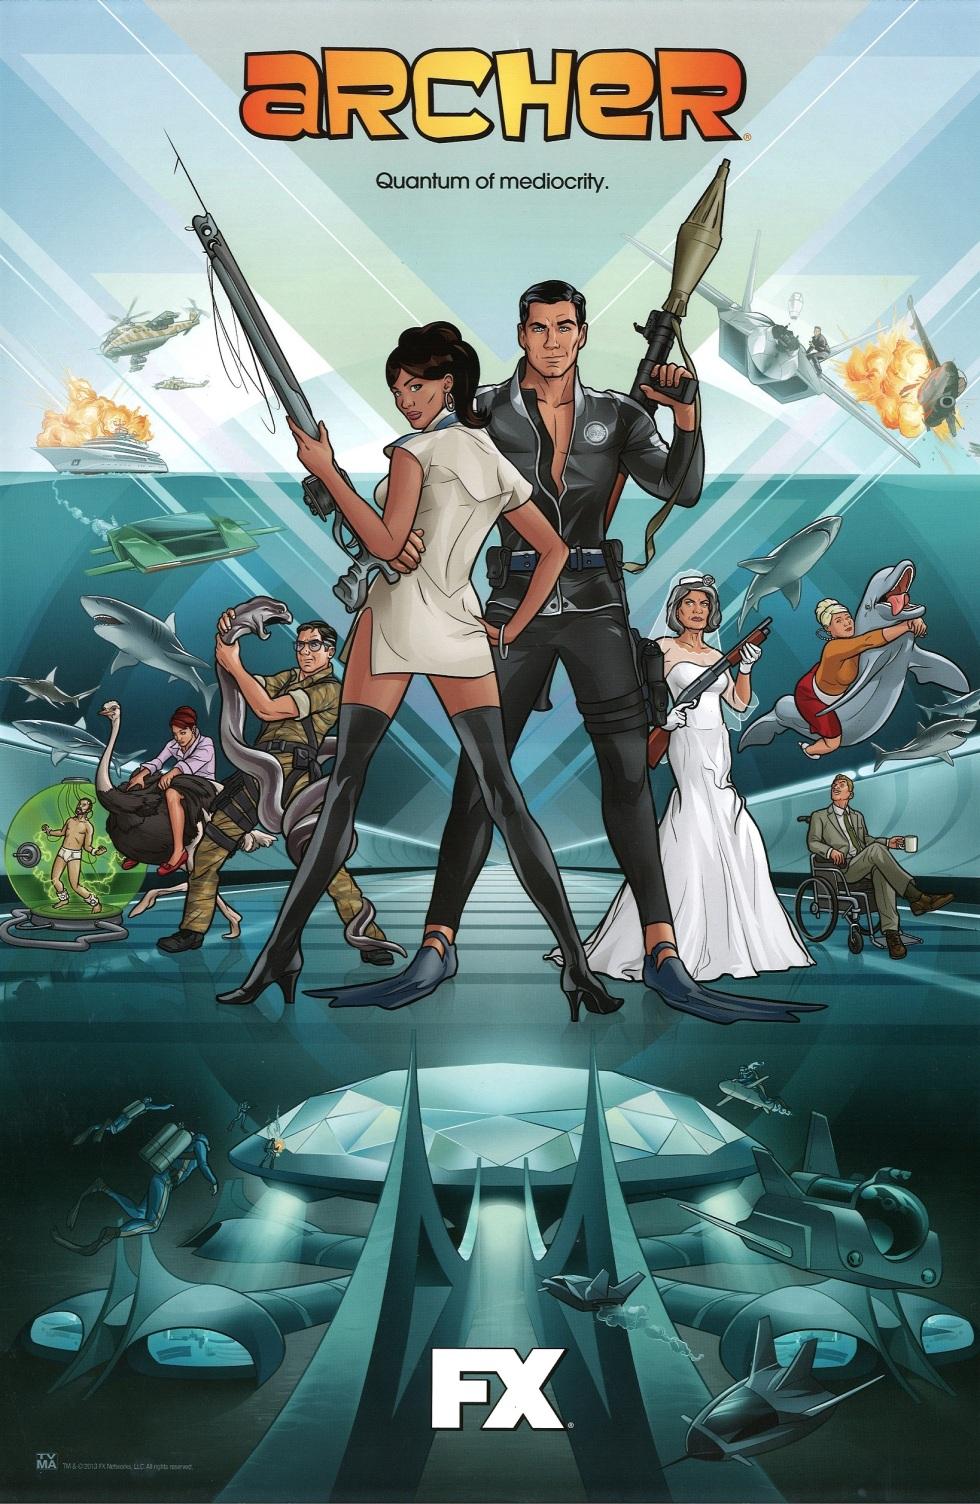 Archer TV series poster